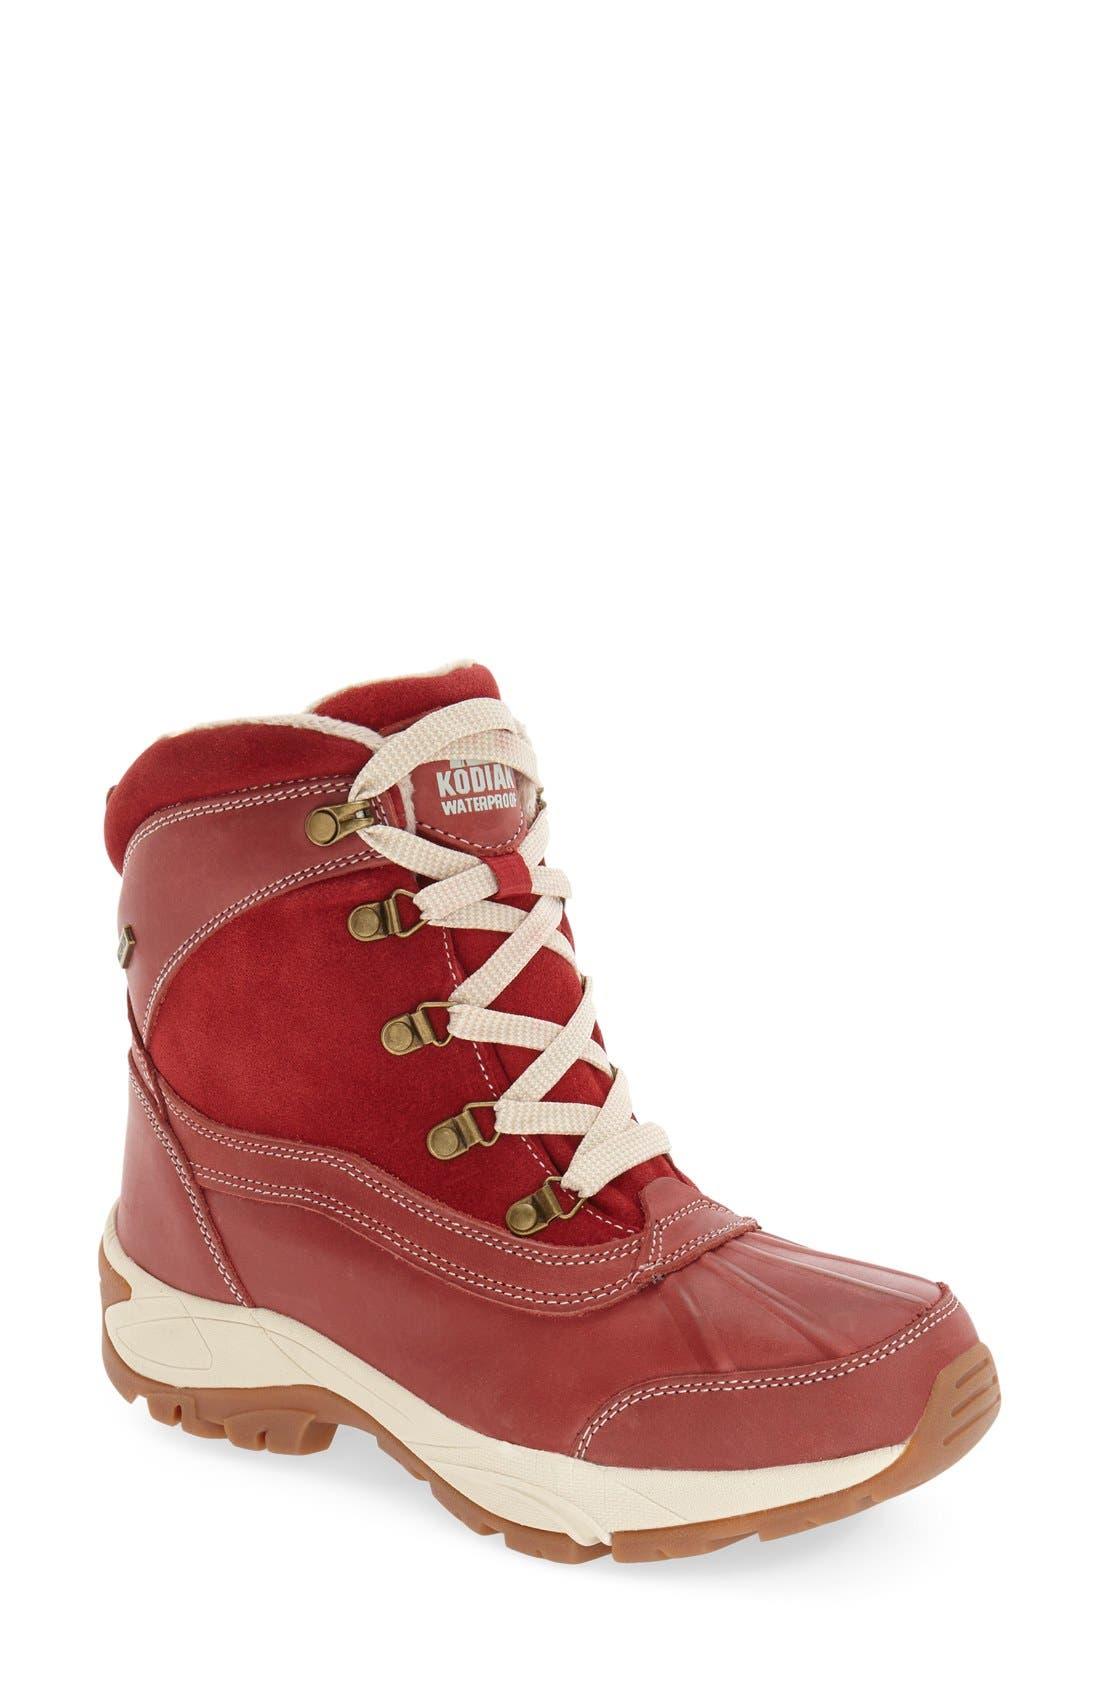 KODIAK 'Renee' Waterproof Insulated Winter Boot